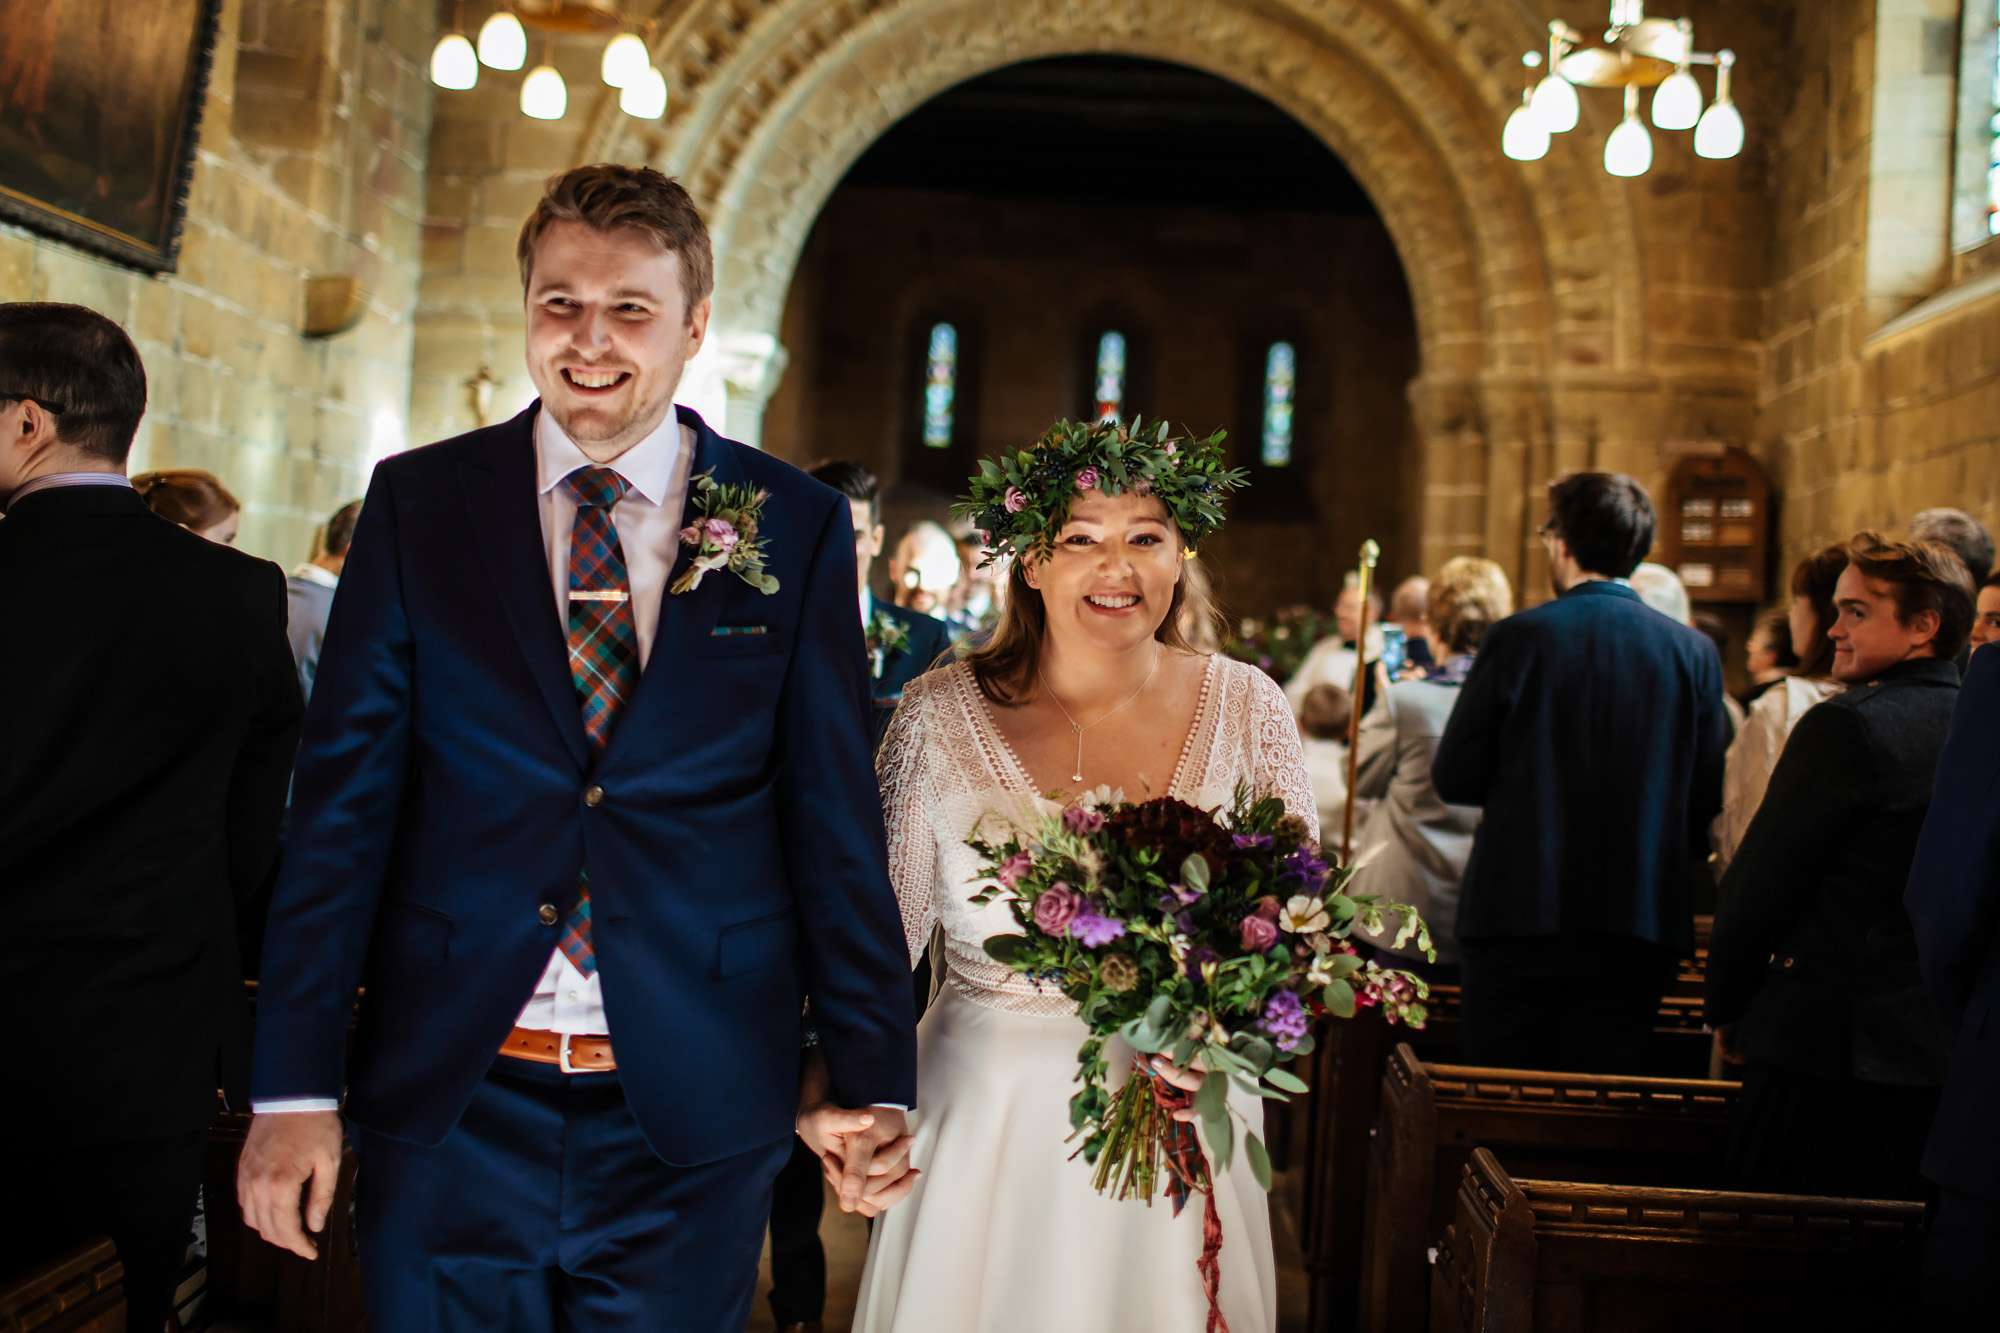 Bride and groom walking down the aisle in Leeds